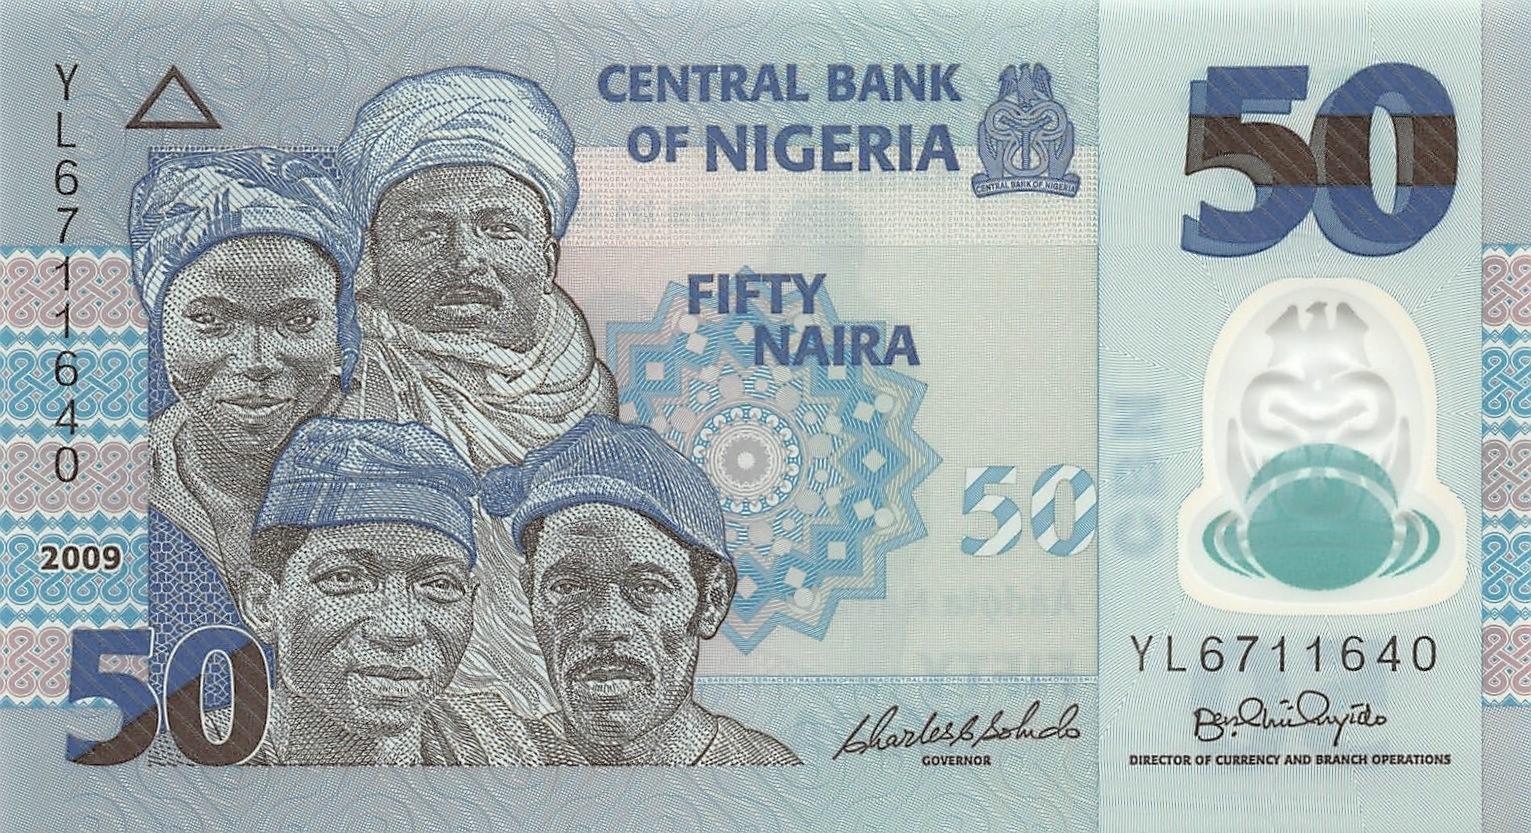 Nigeria 50 Naira 2009 Polymer Unc Pn